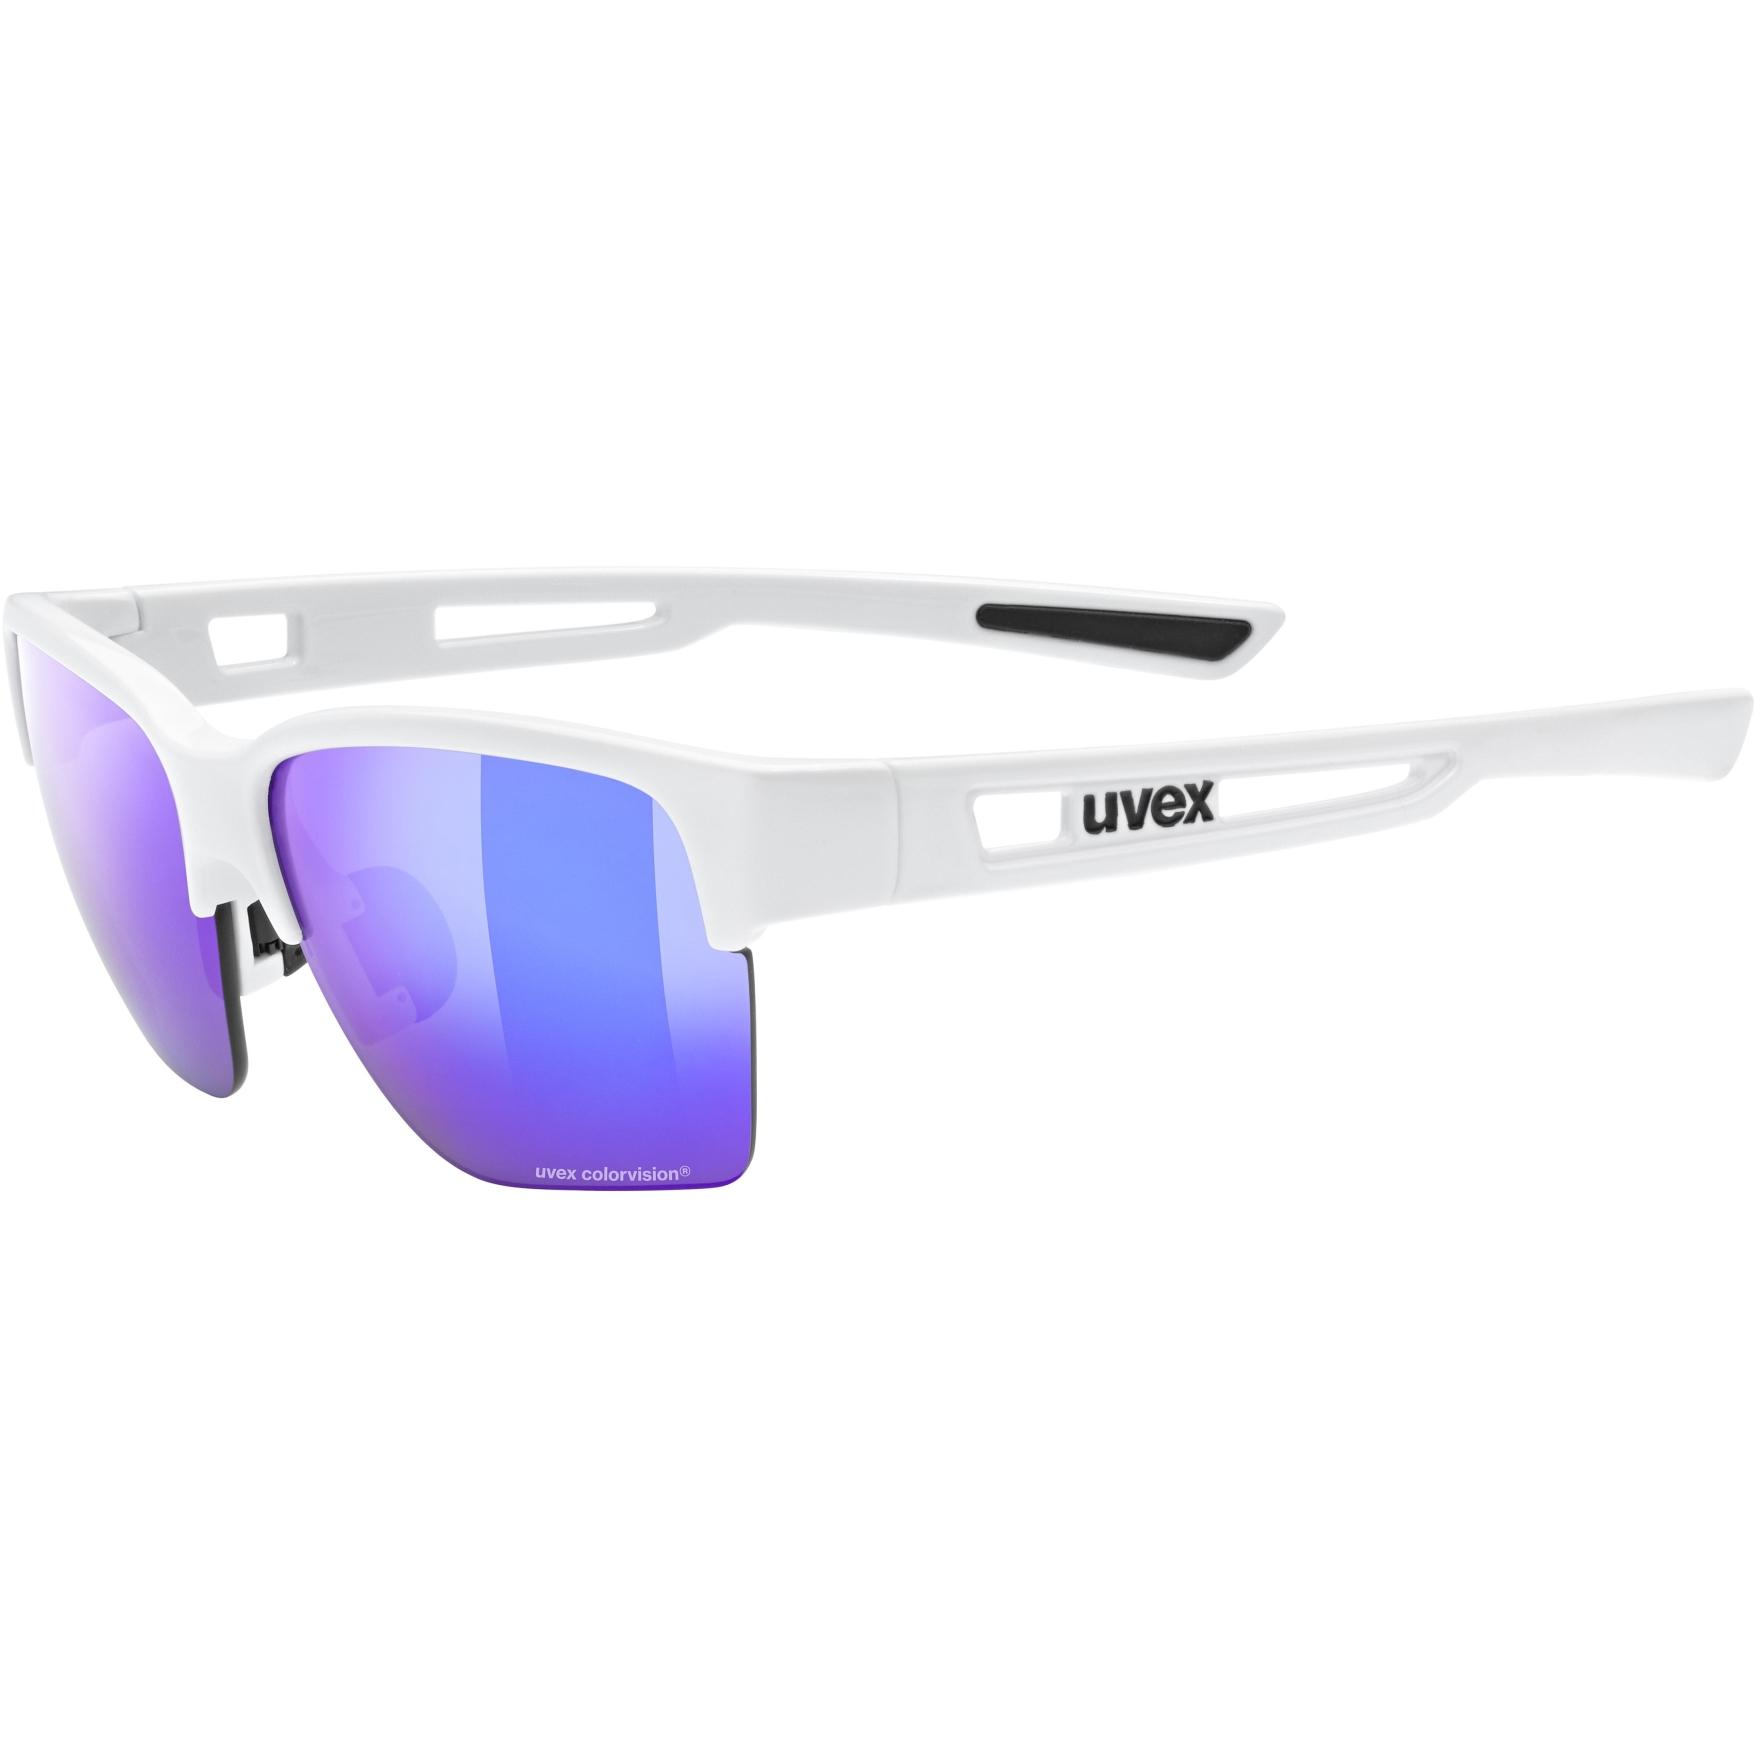 Uvex sportstyle 805 CV Glasses - white/colorvision mirror plasma